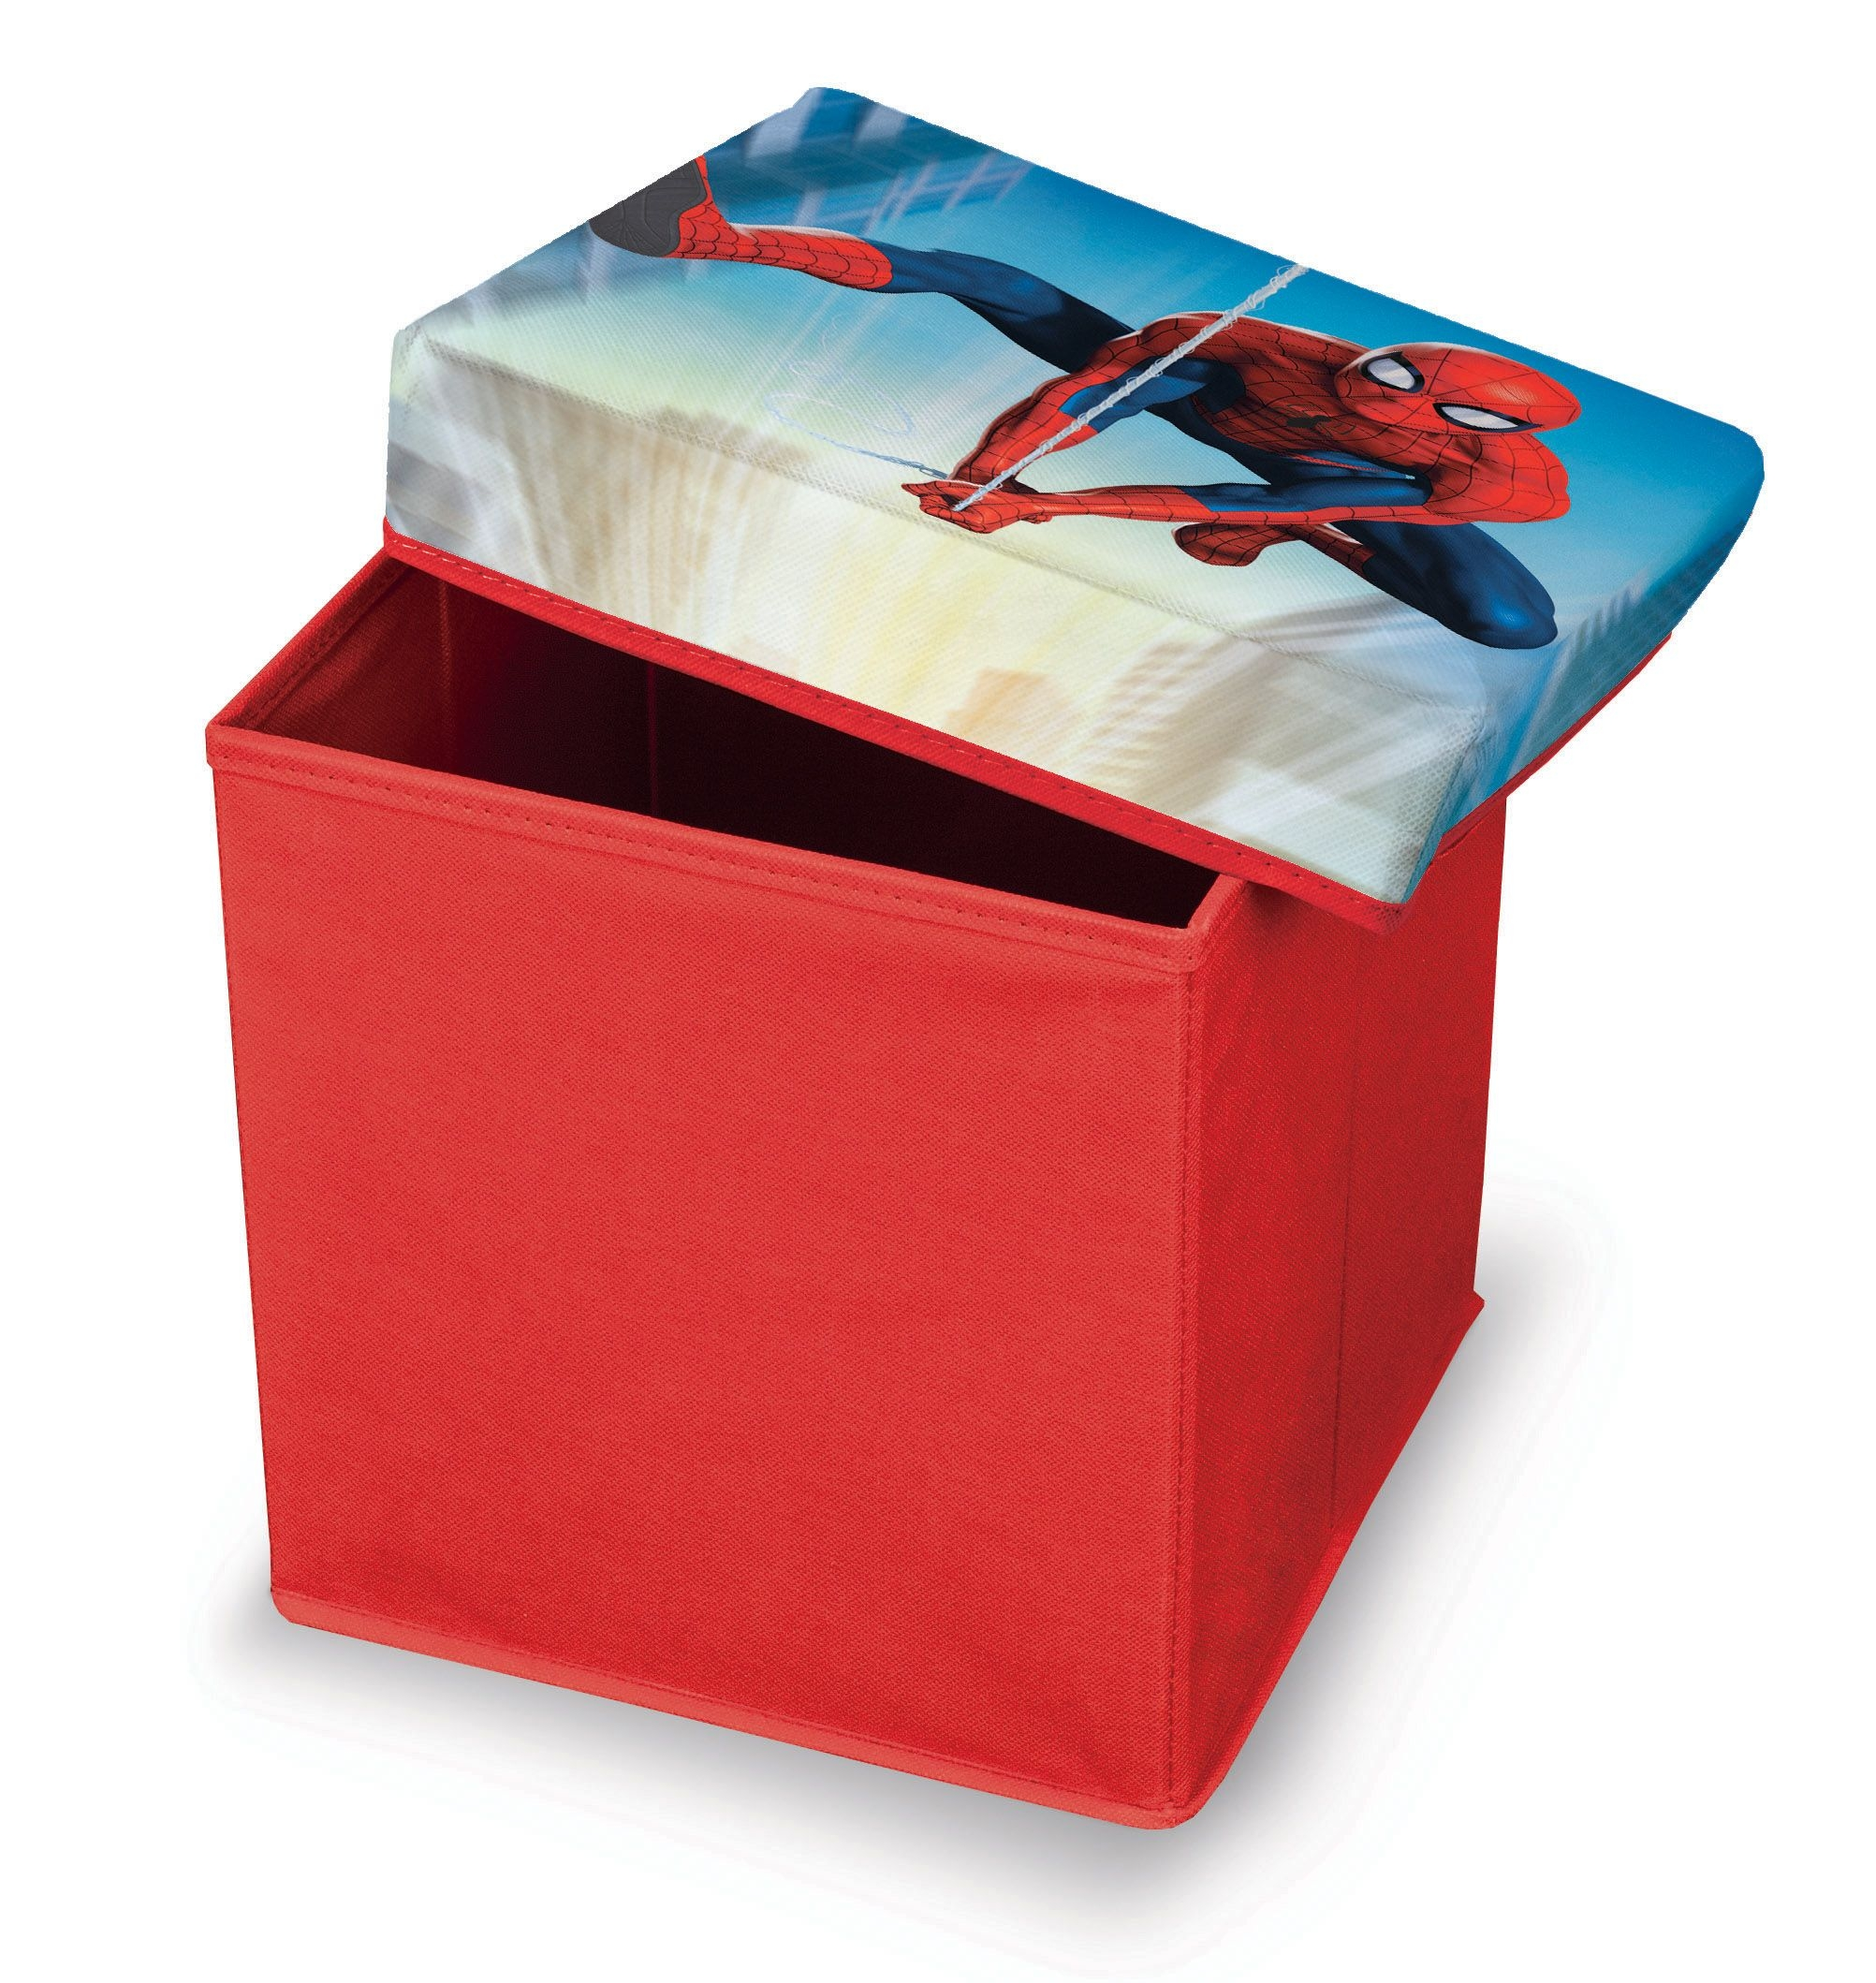 Taburet pentru copii cu spatiu de depozitare Spiderman Rosu, l30xA30xH30 cm